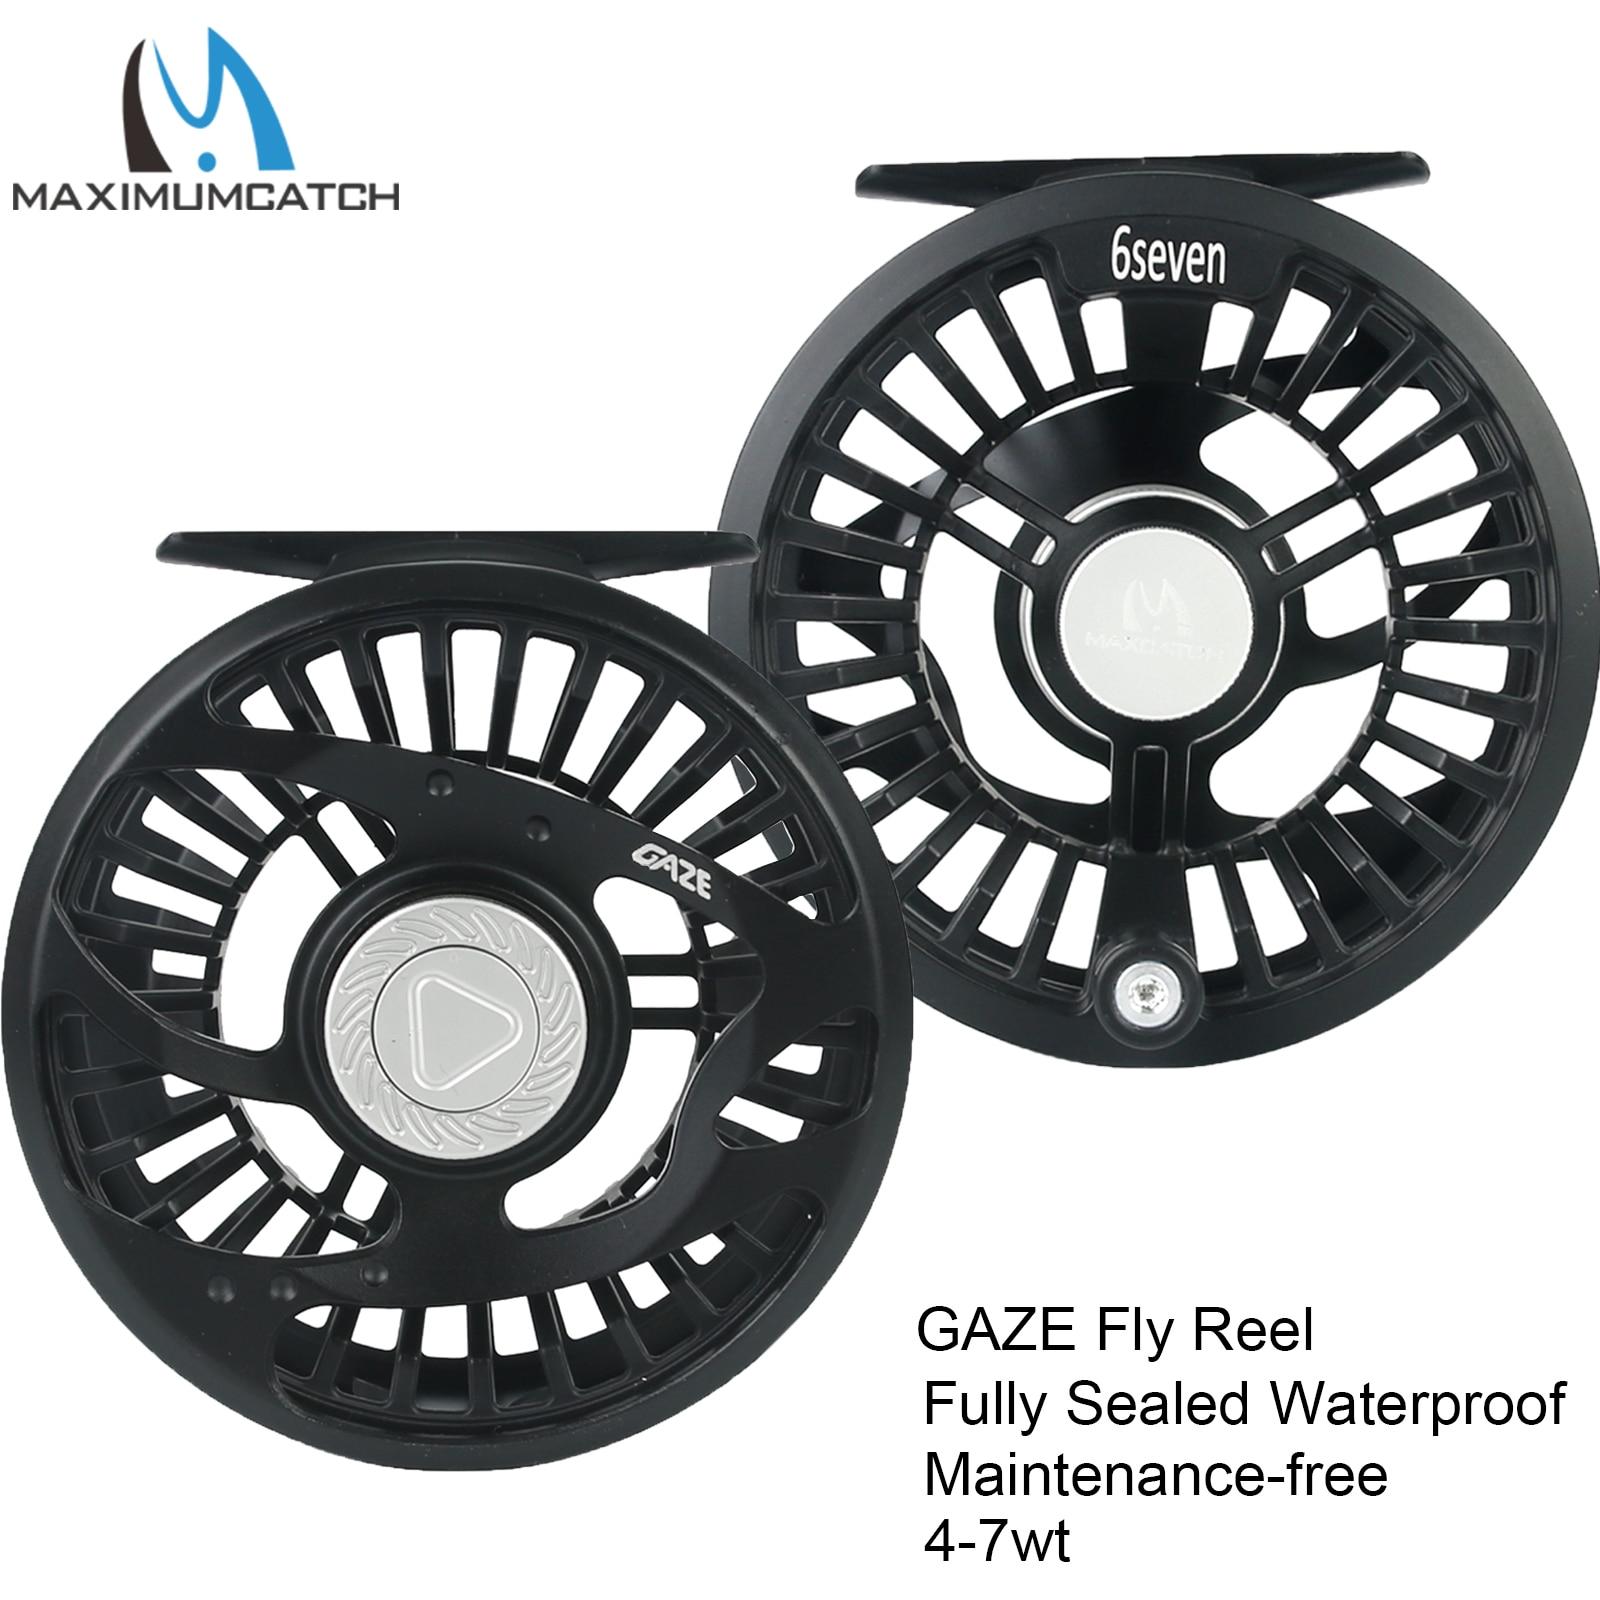 Maximumcatch Maxcatch GAZE 4-7WT Trout Light Weight Fly Fishing Reel Waterproof Sealed Drag Fly Reel